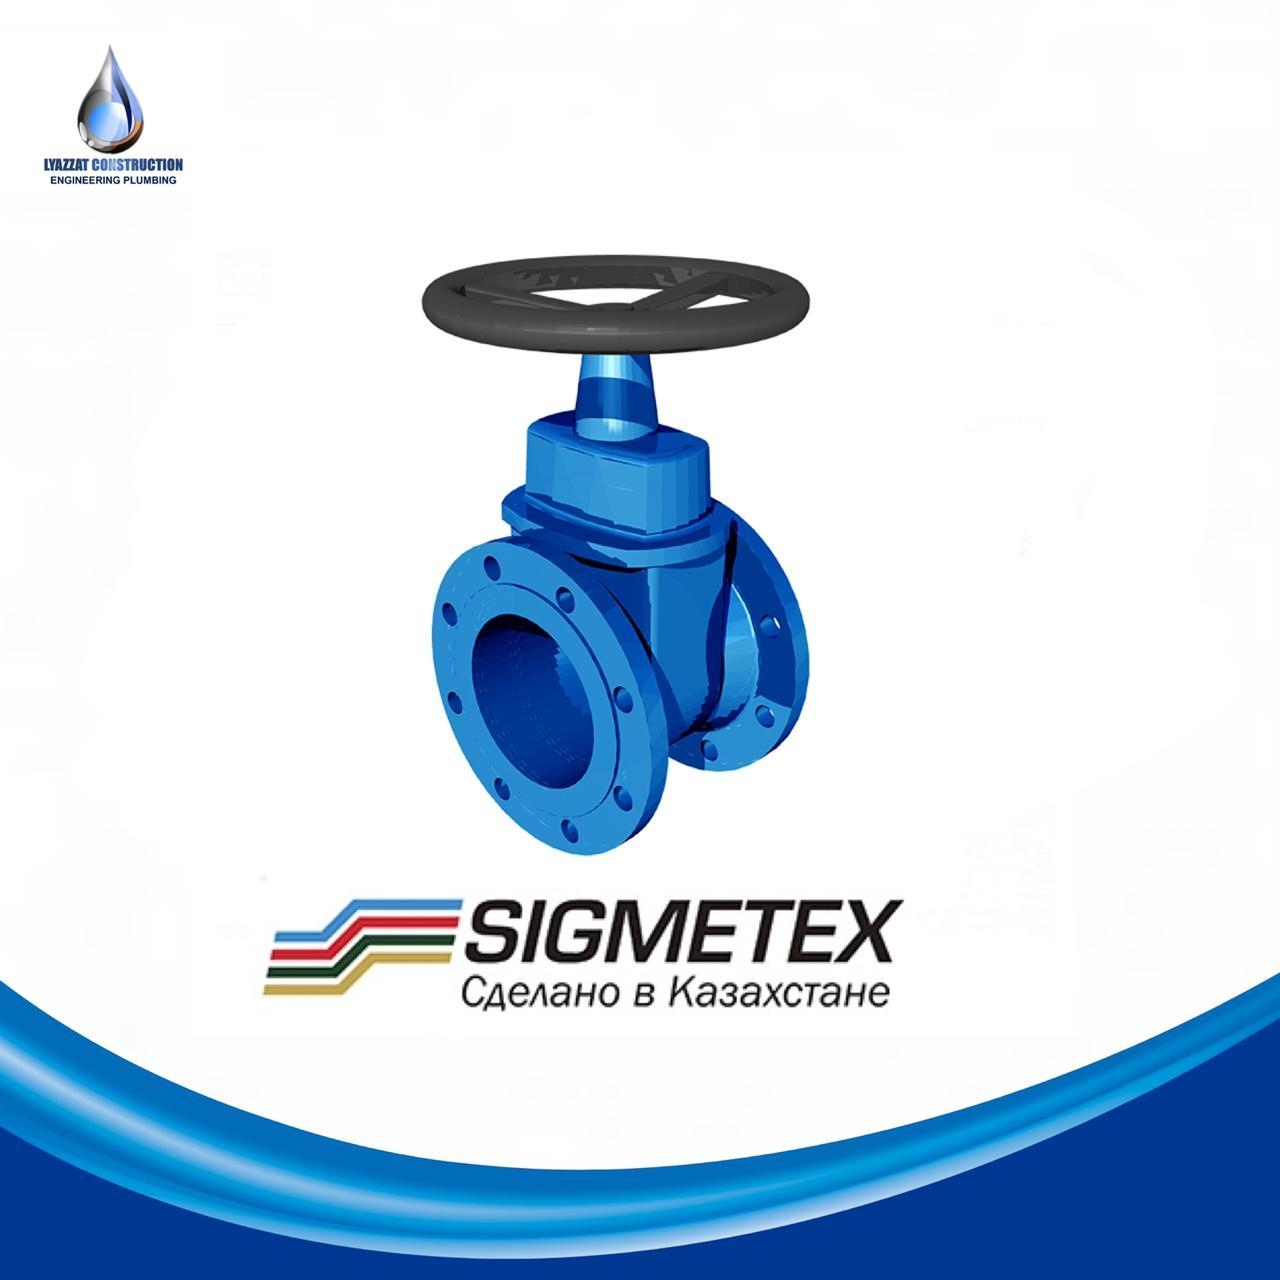 Задвижка Sigmetex DN 250 (Сигметэкс)